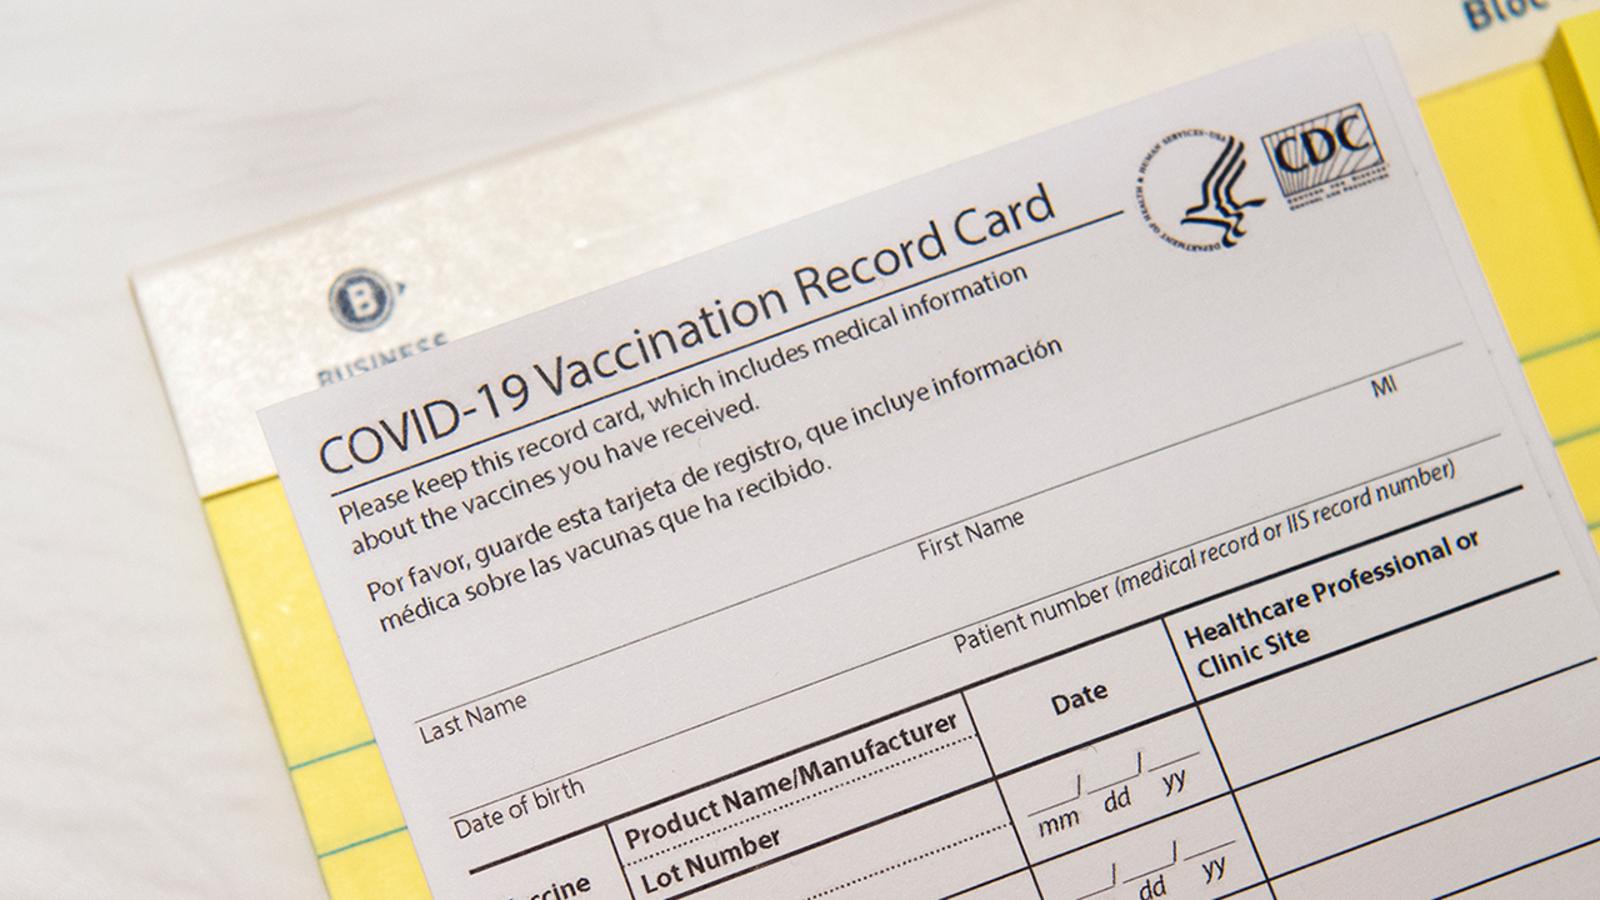 10772021 061021 cc cnn vaccine card file img jpeg?w=1600.